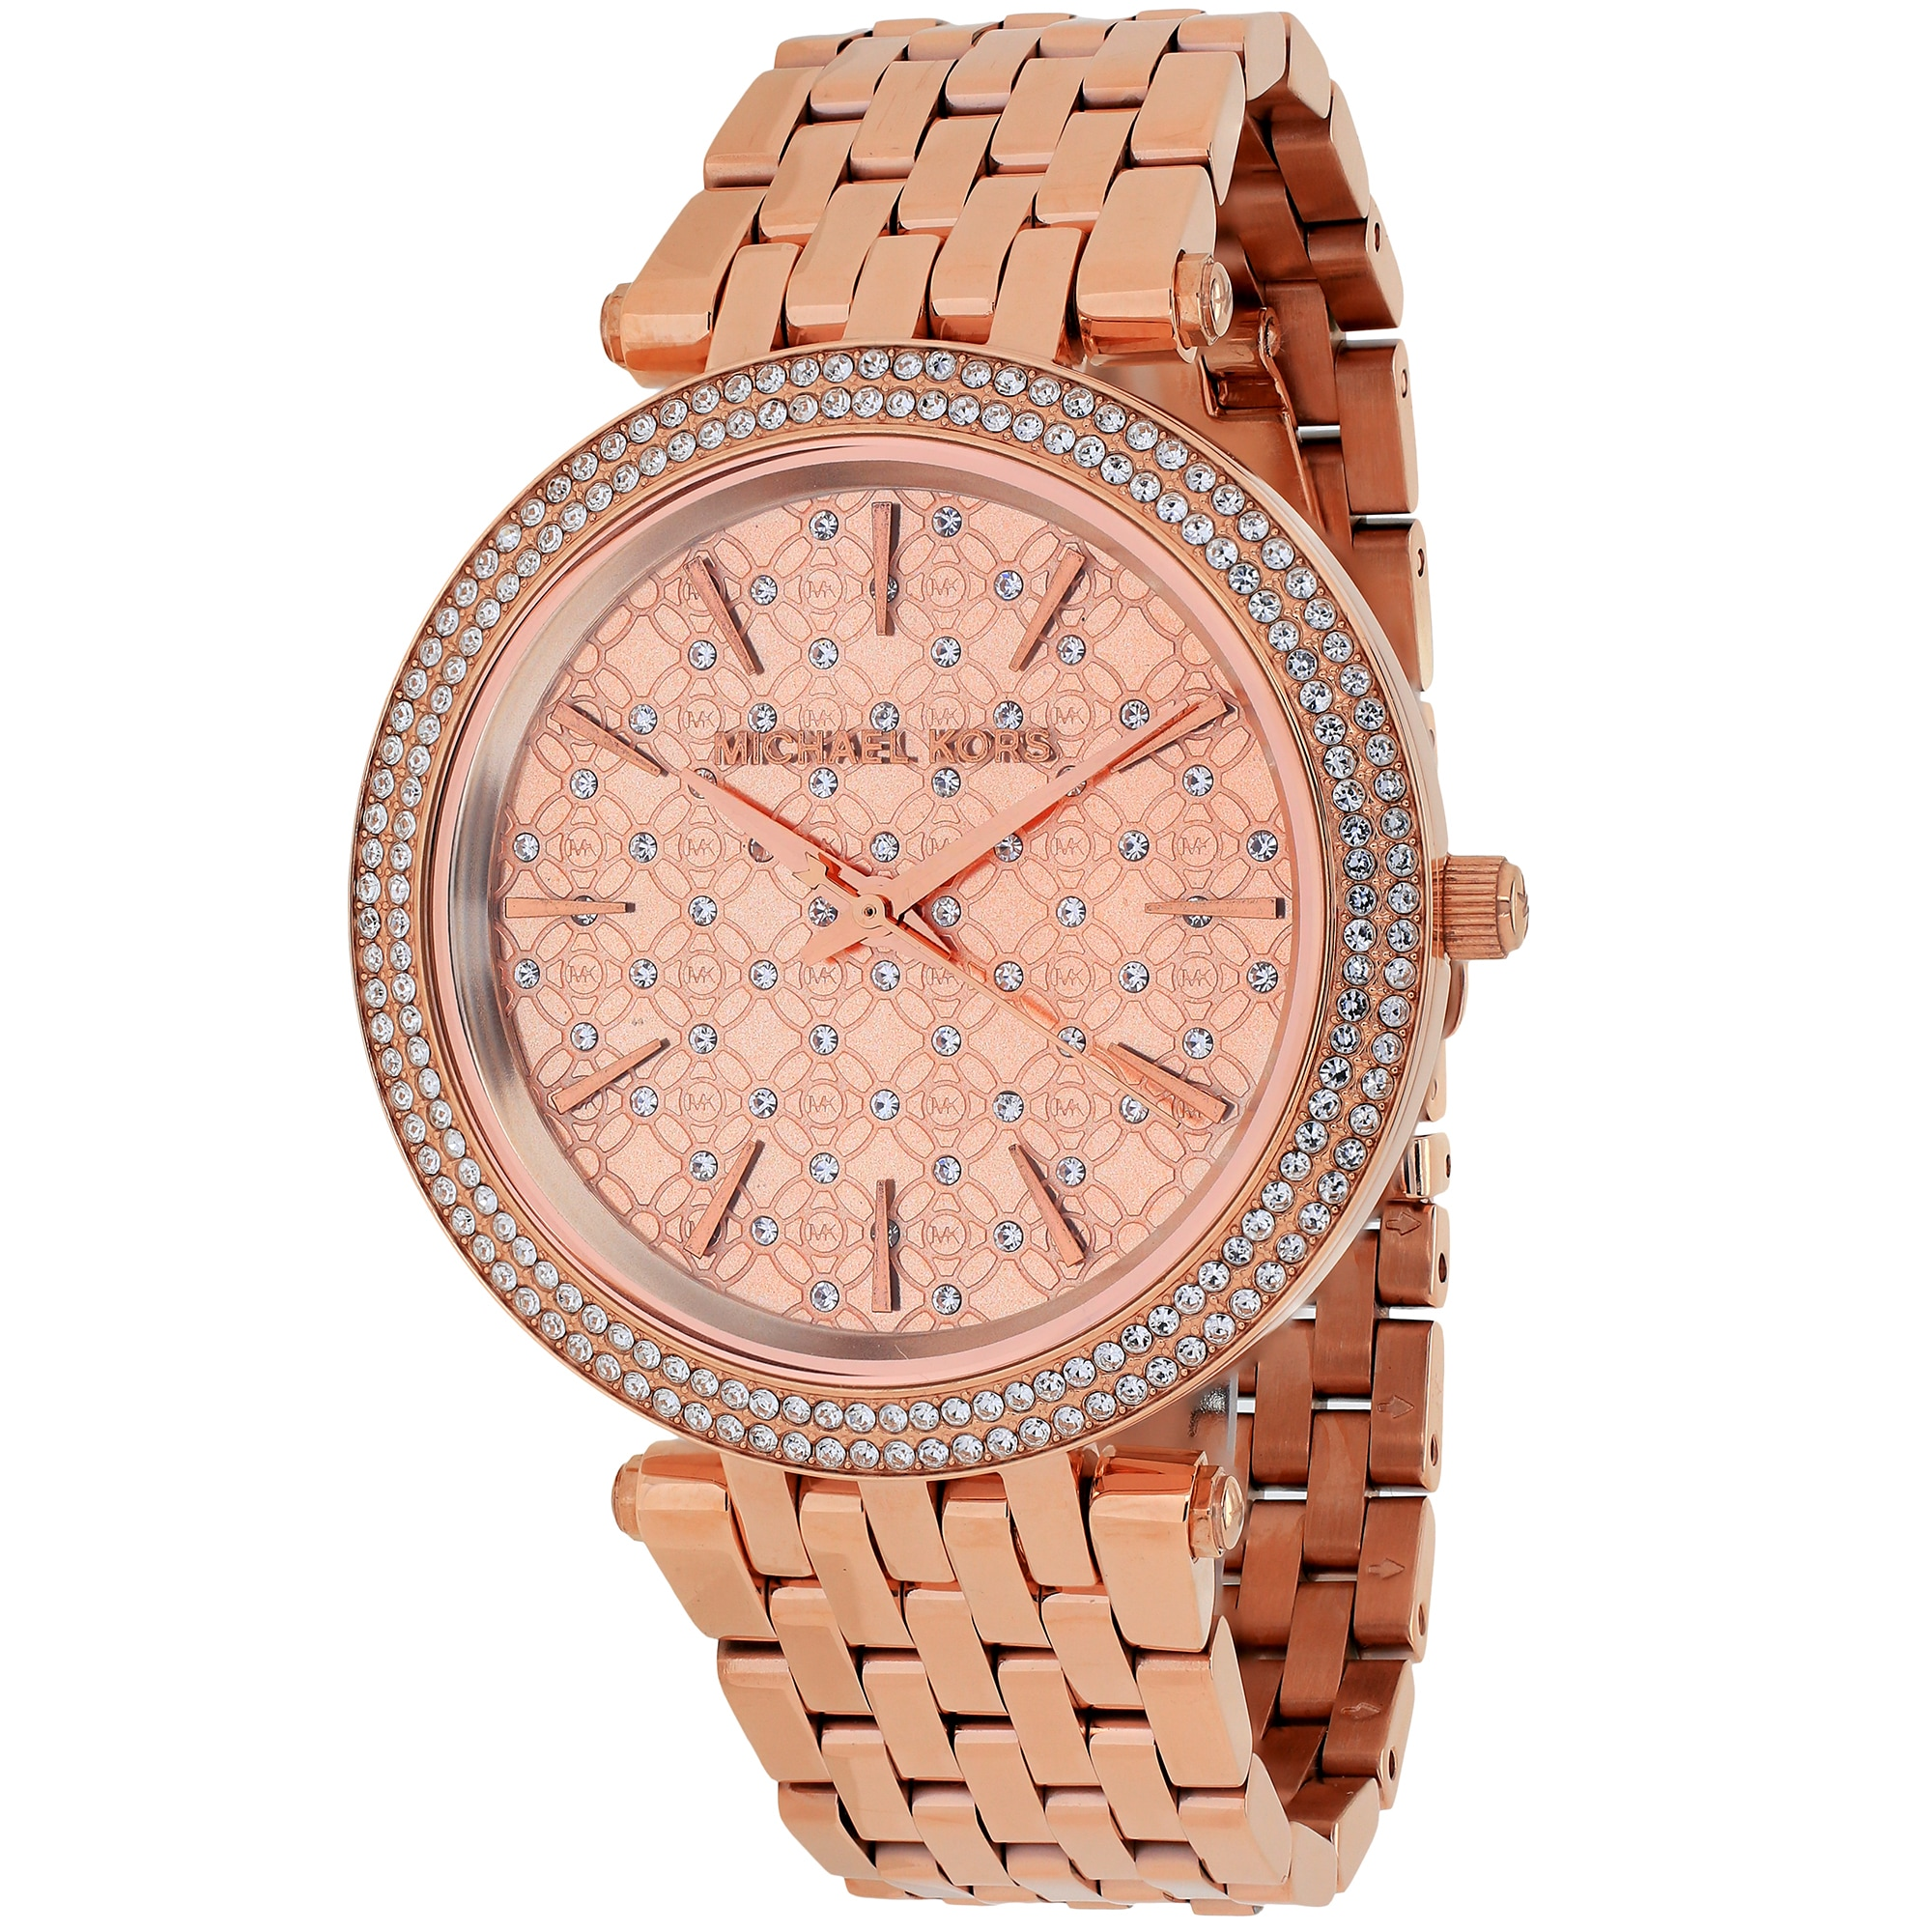 63415bfb841f Shop Michael Kors Women s MK3399 Darci Round Rose Gold-tone Bracelet Watch  - Free Shipping Today - Overstock - 10280410